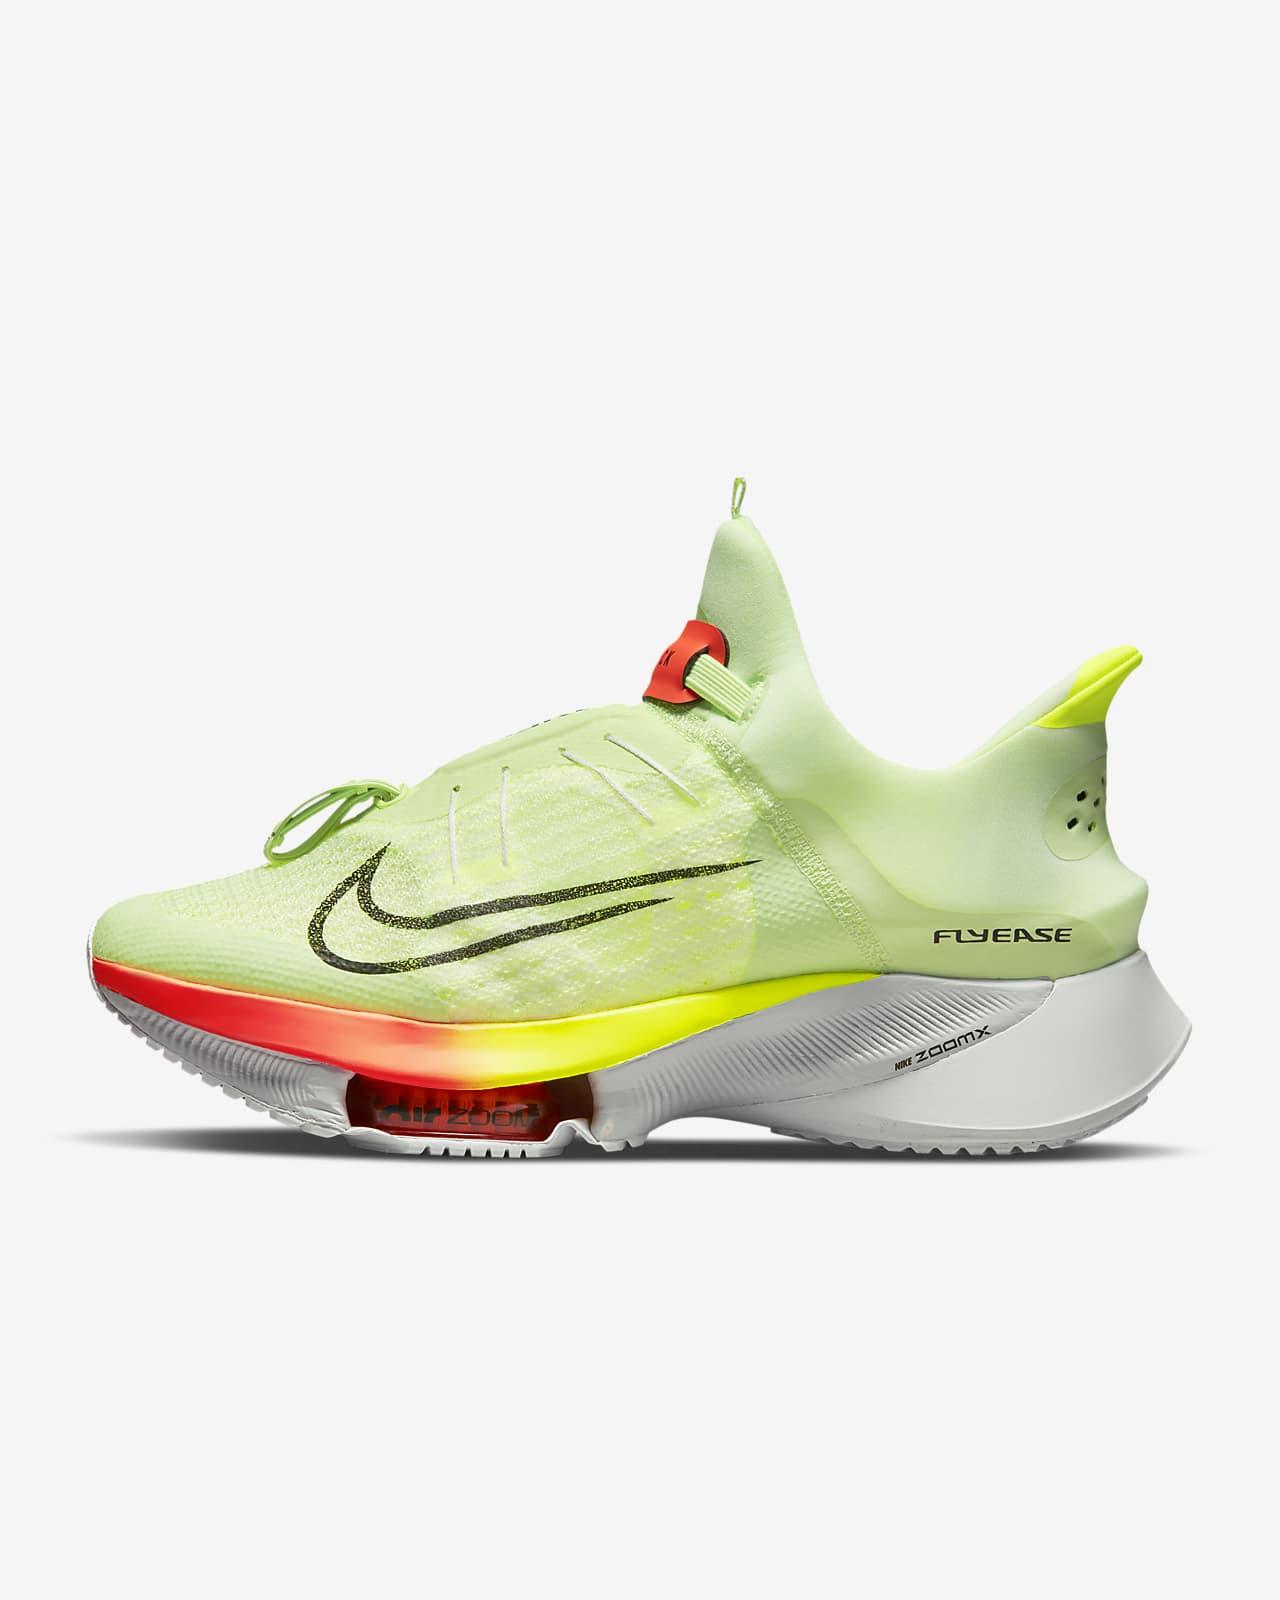 Мужские кроссовки для бега по шоссе Nike Air Zoom Tempo NEXT% FlyEase